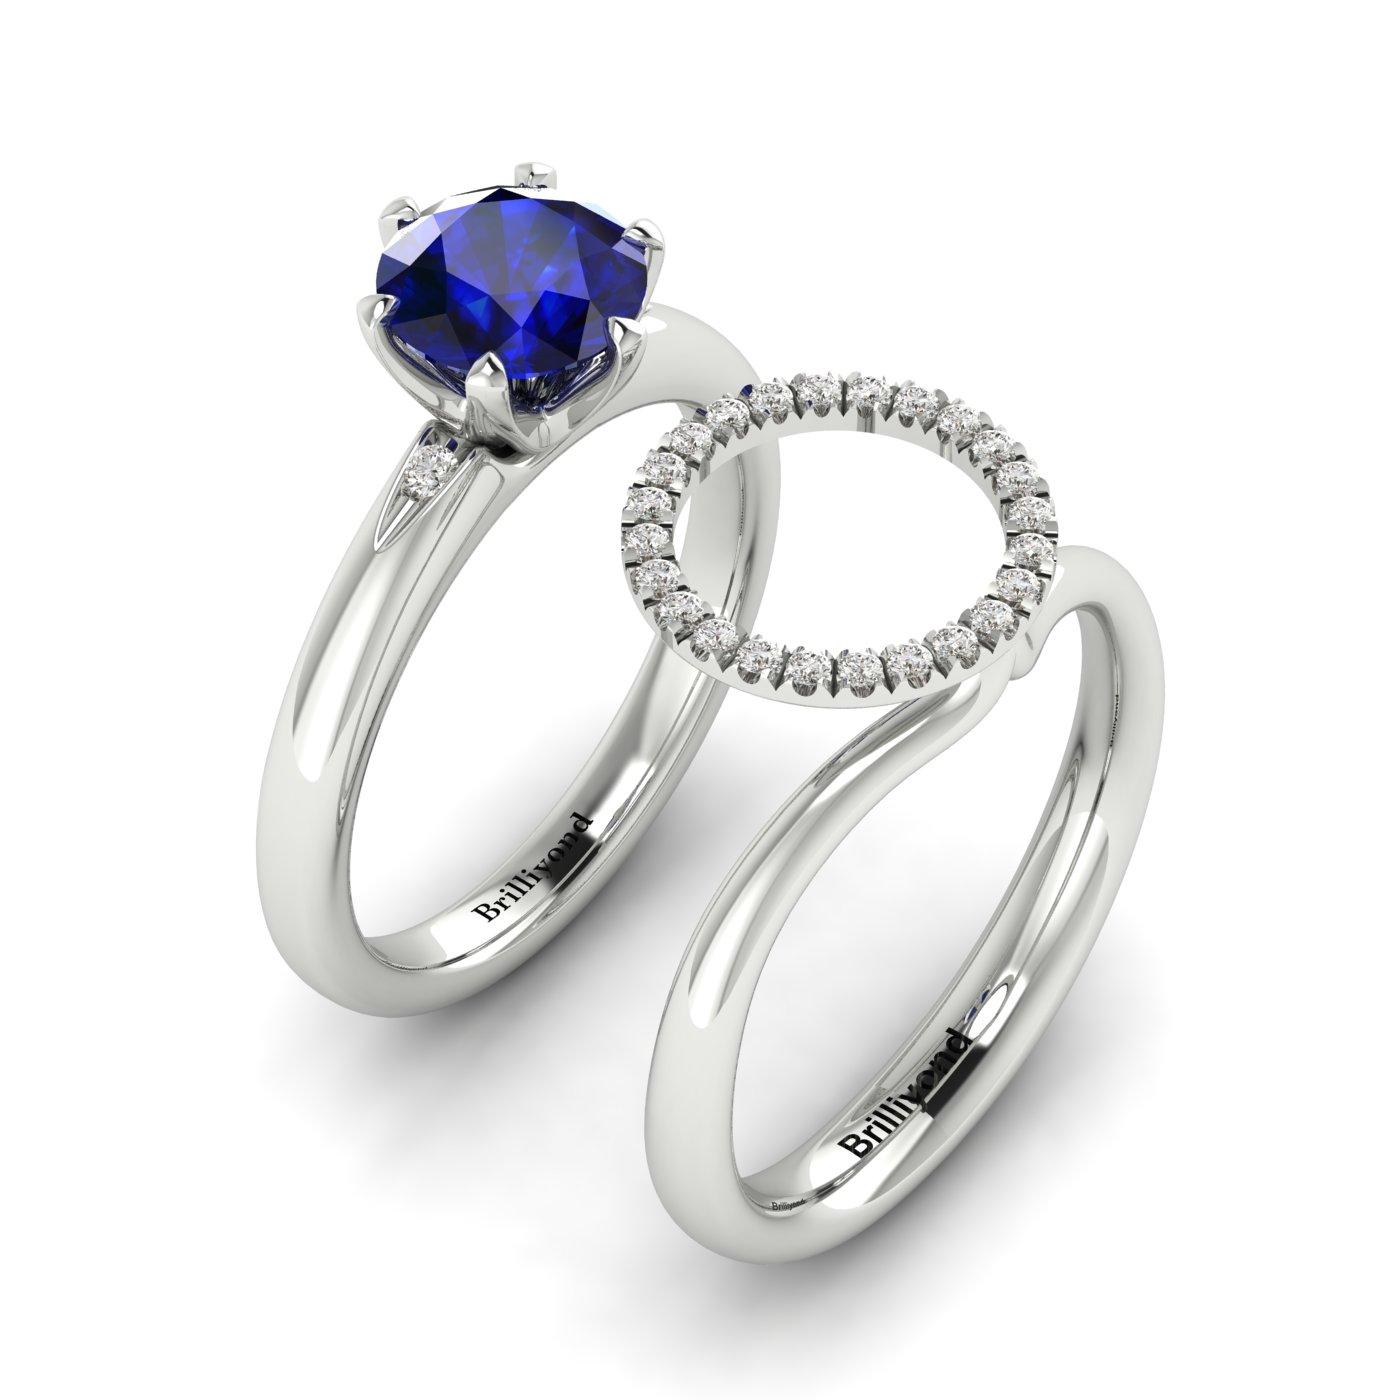 Diamond Halo Ring Guard Enhancer Byond_image3